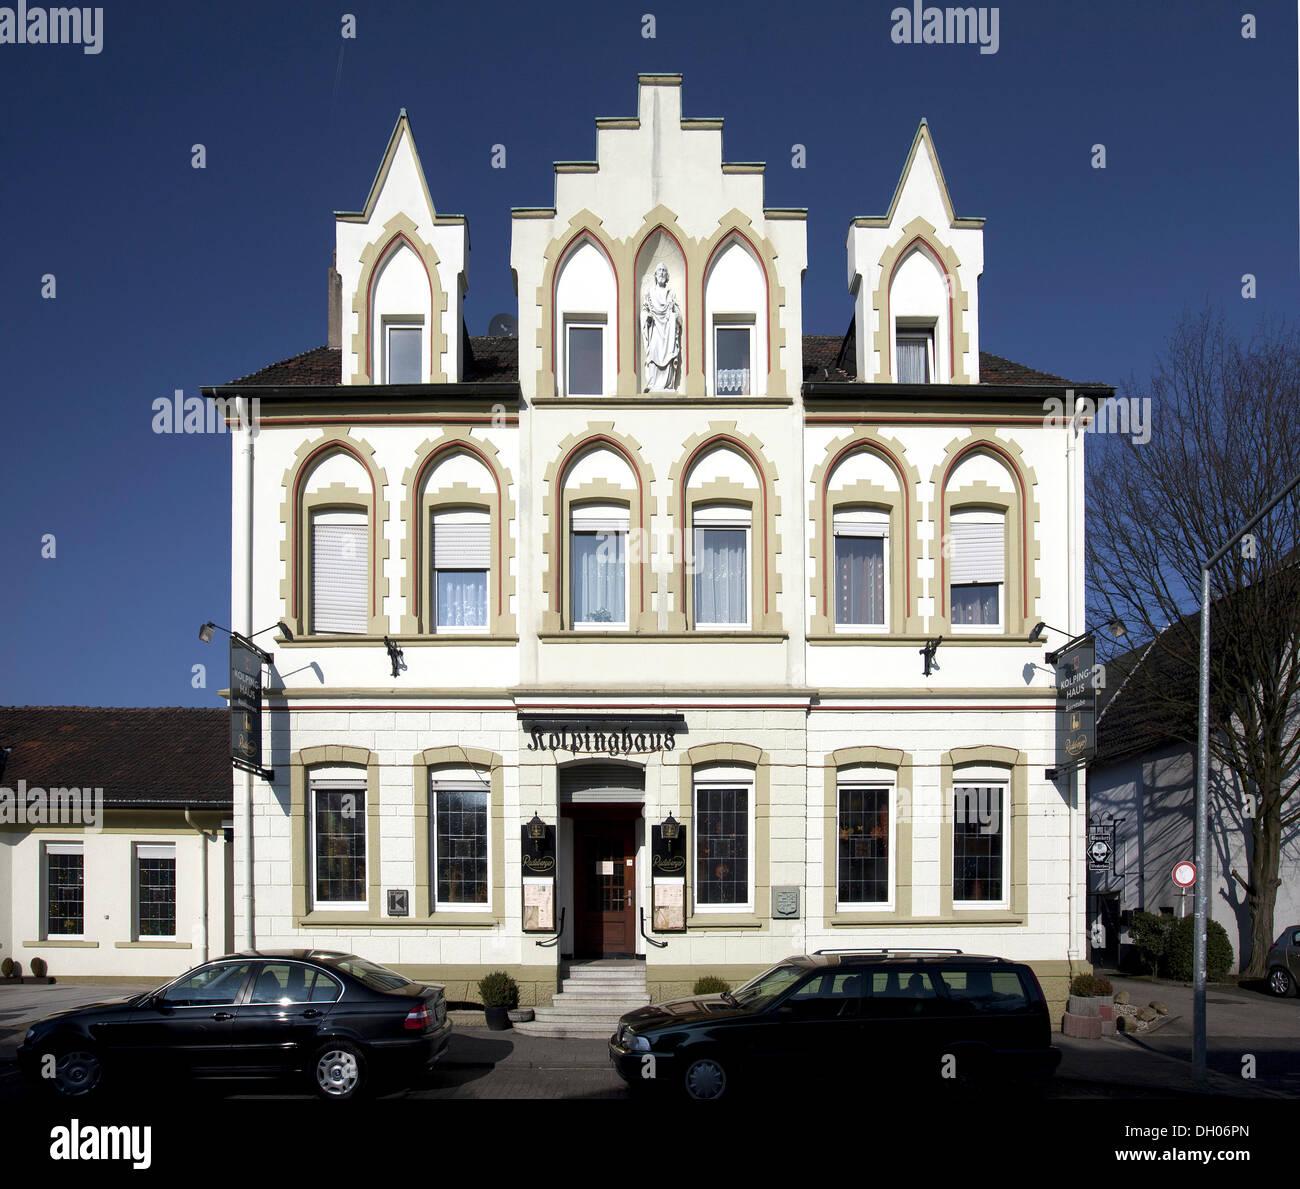 Kolping House, Herten, Westerholt district, Ruhr Area, North Rhine-Westphalia, PublicGround - Stock Image